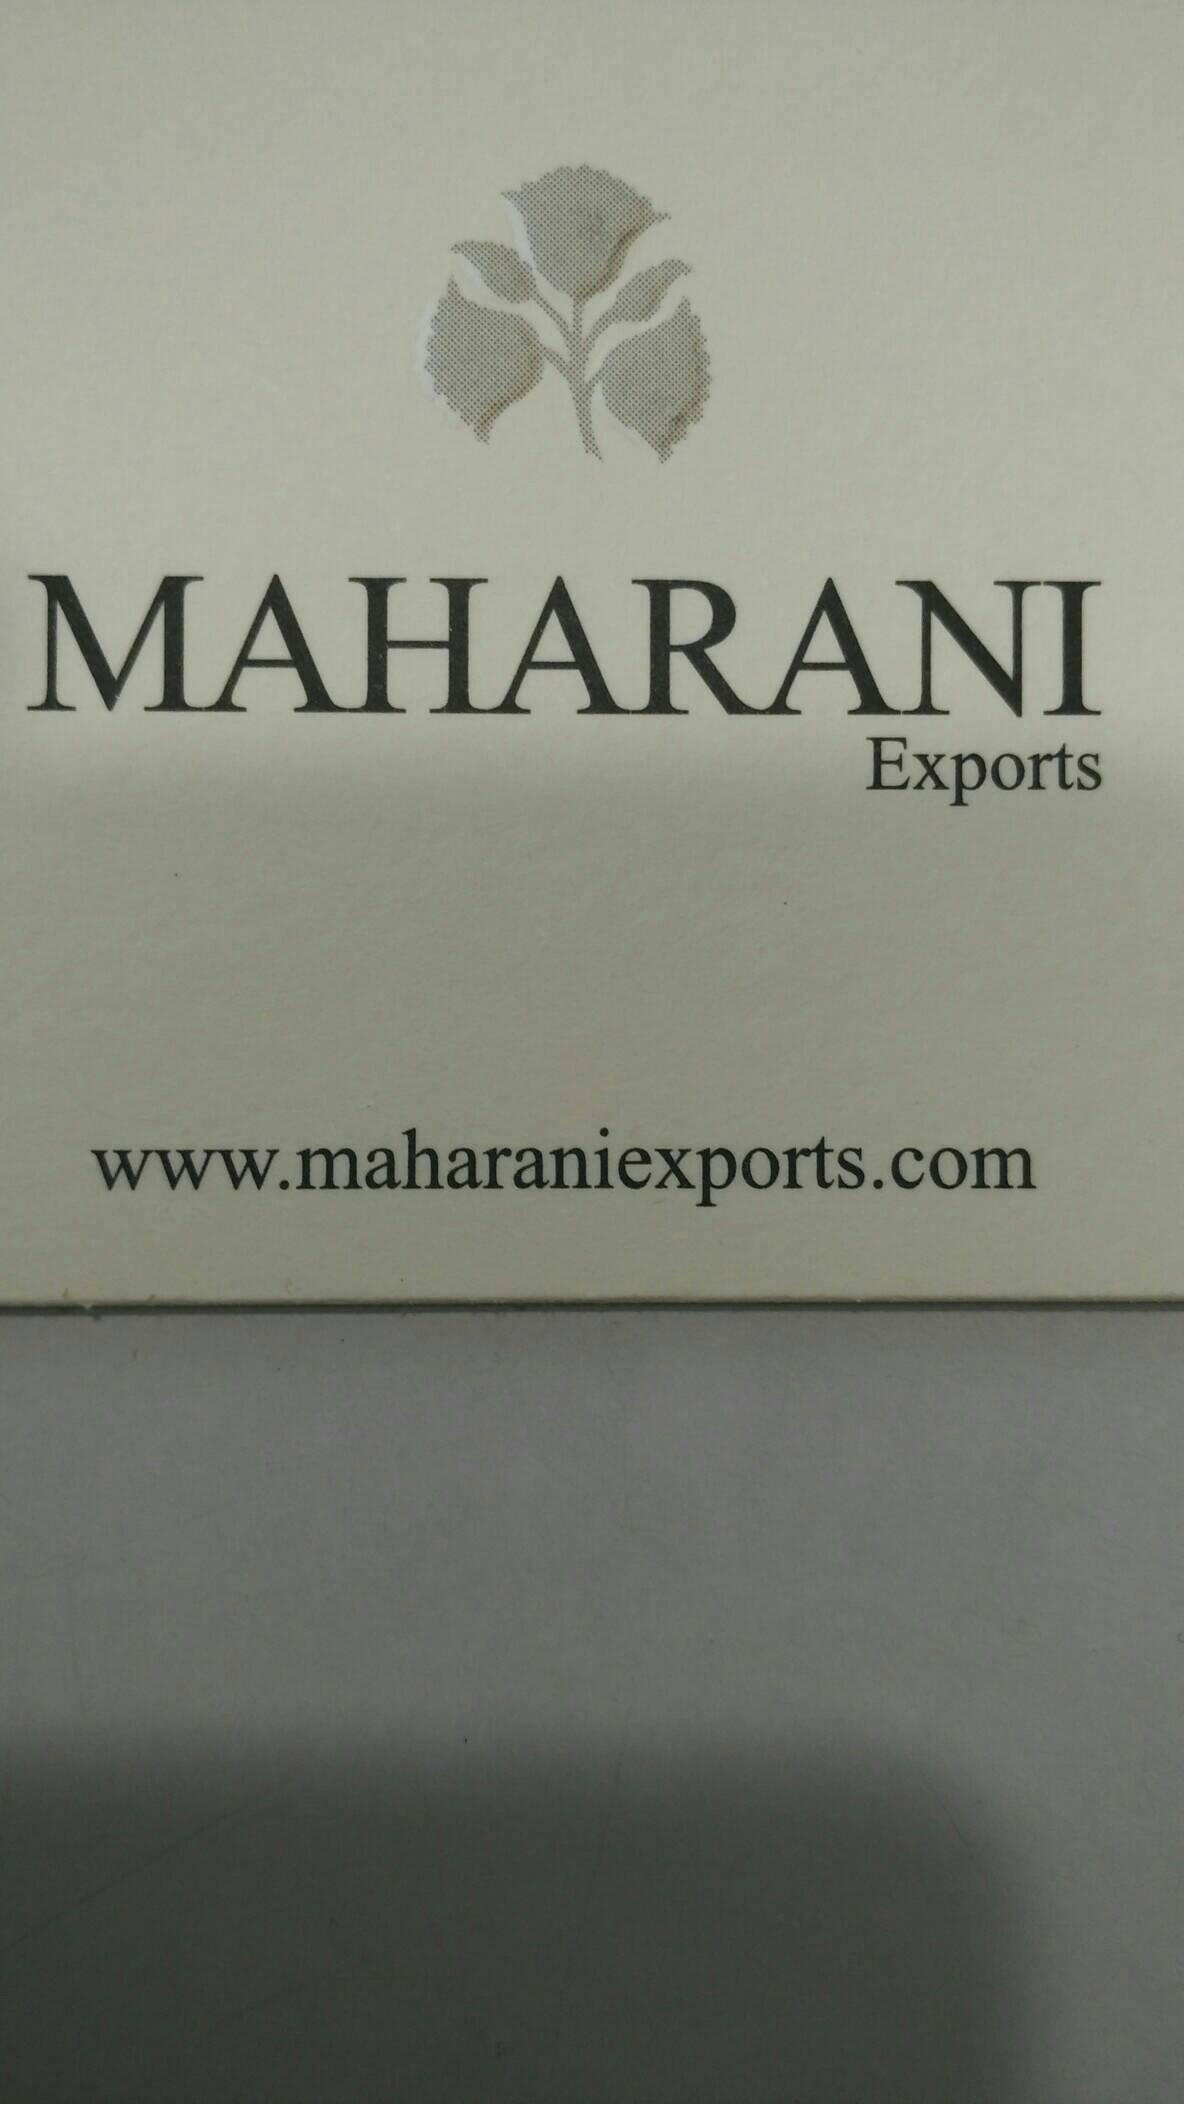 Mahatani Export - logo